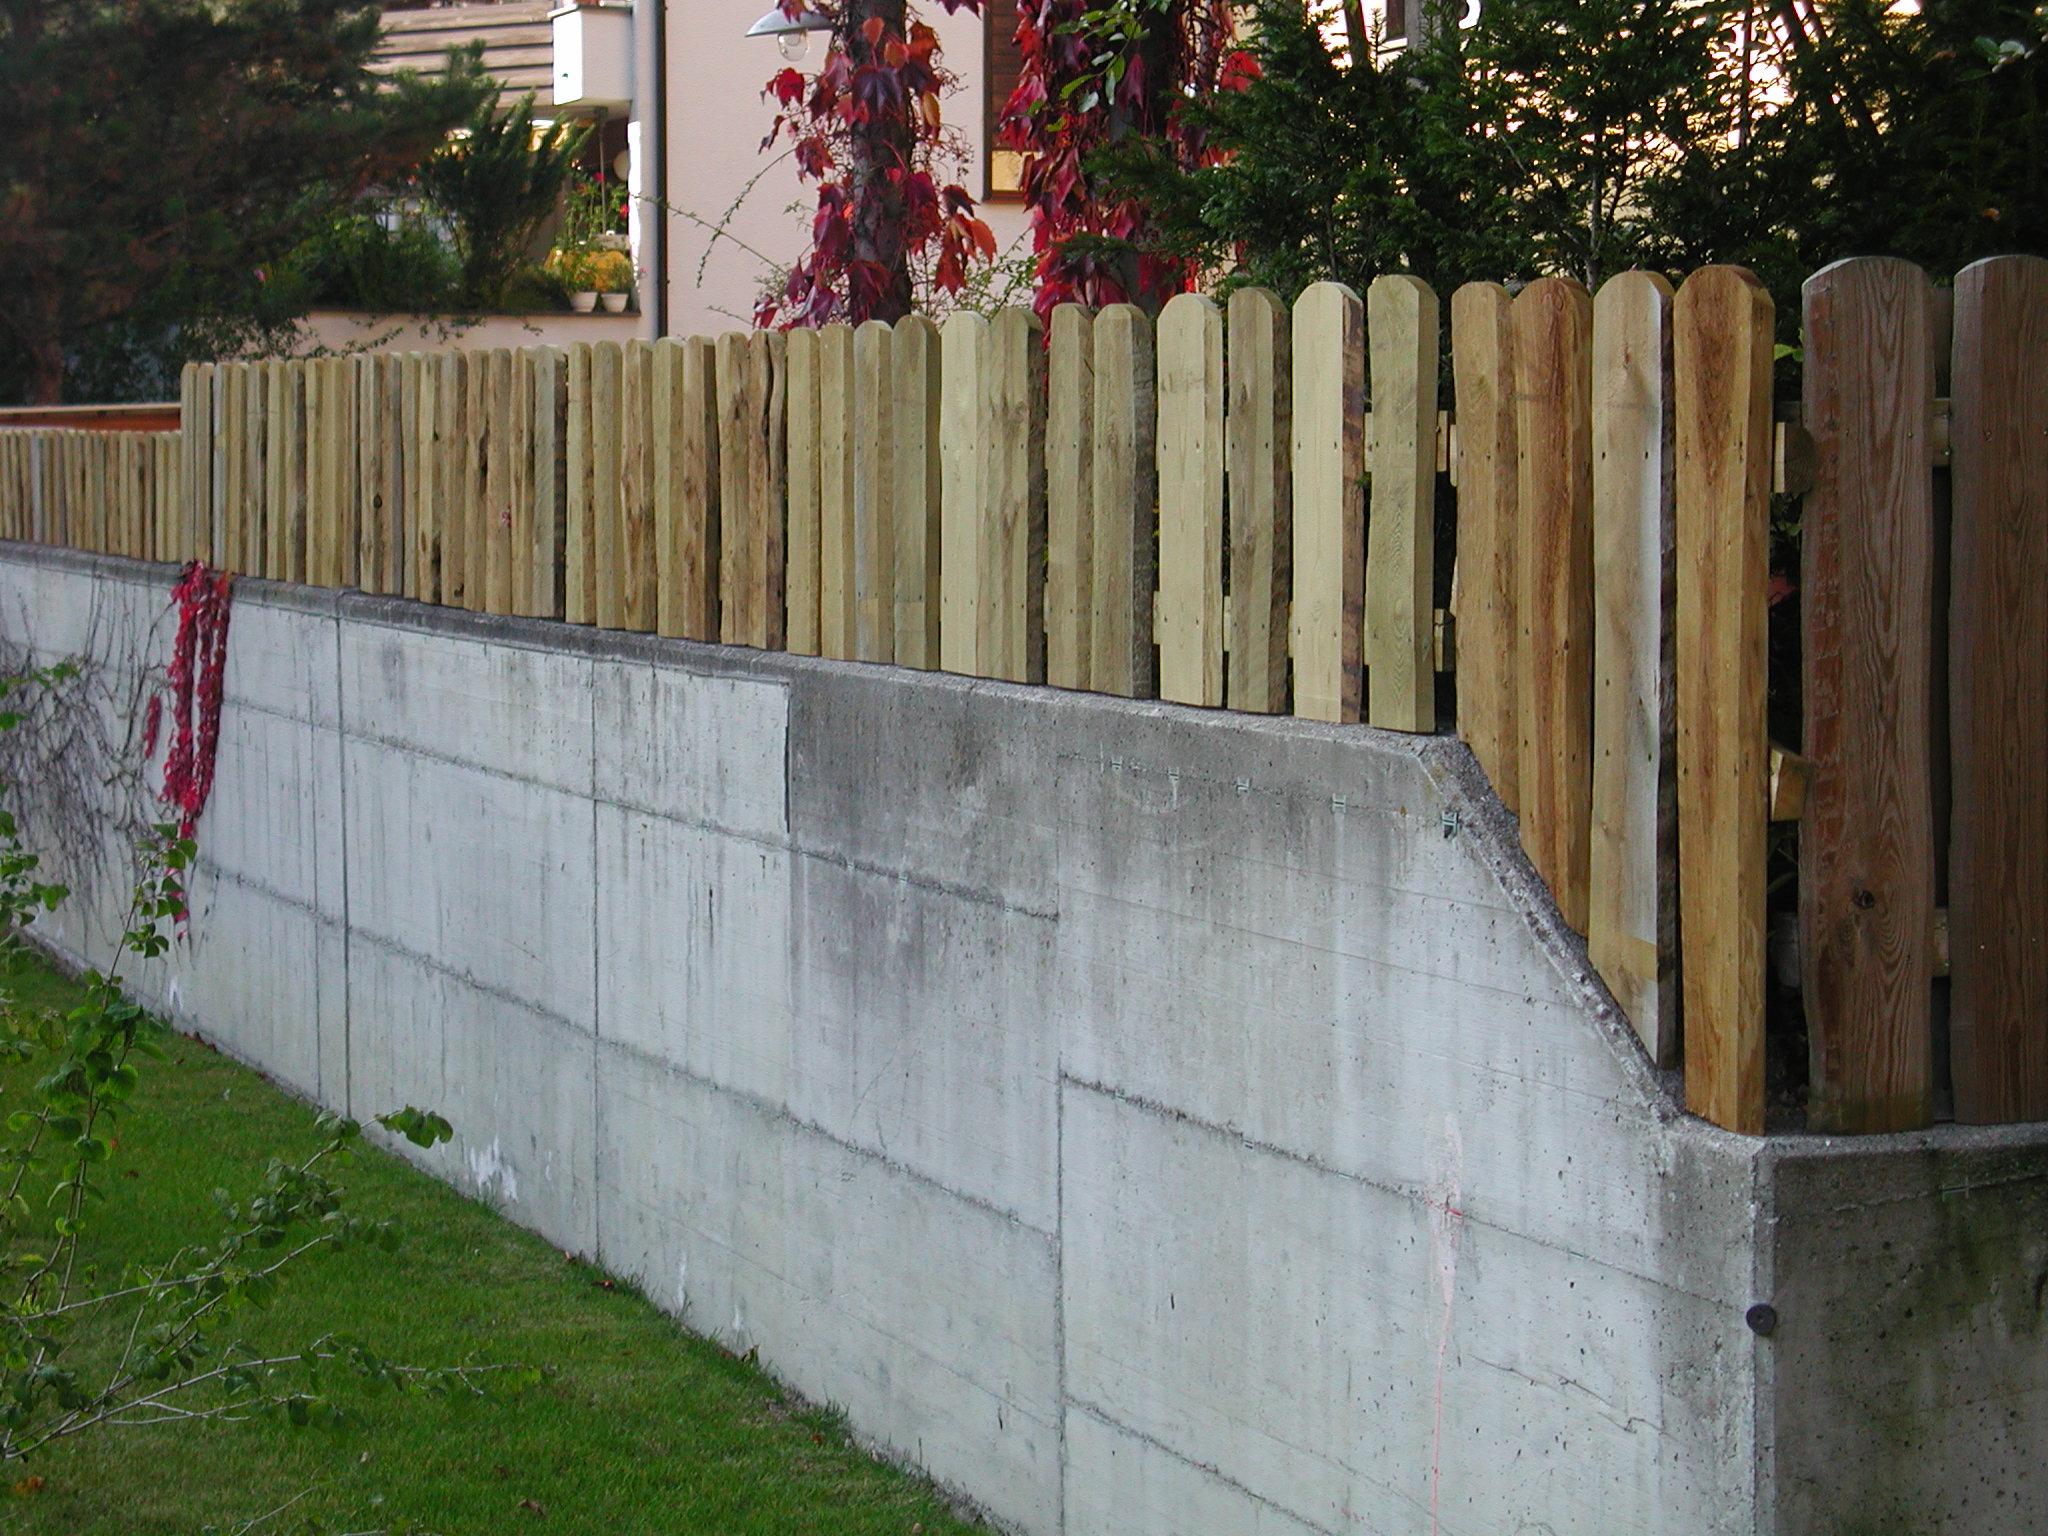 Rancherzaun auf Betonmauer (Spezial- Massanfertigung)